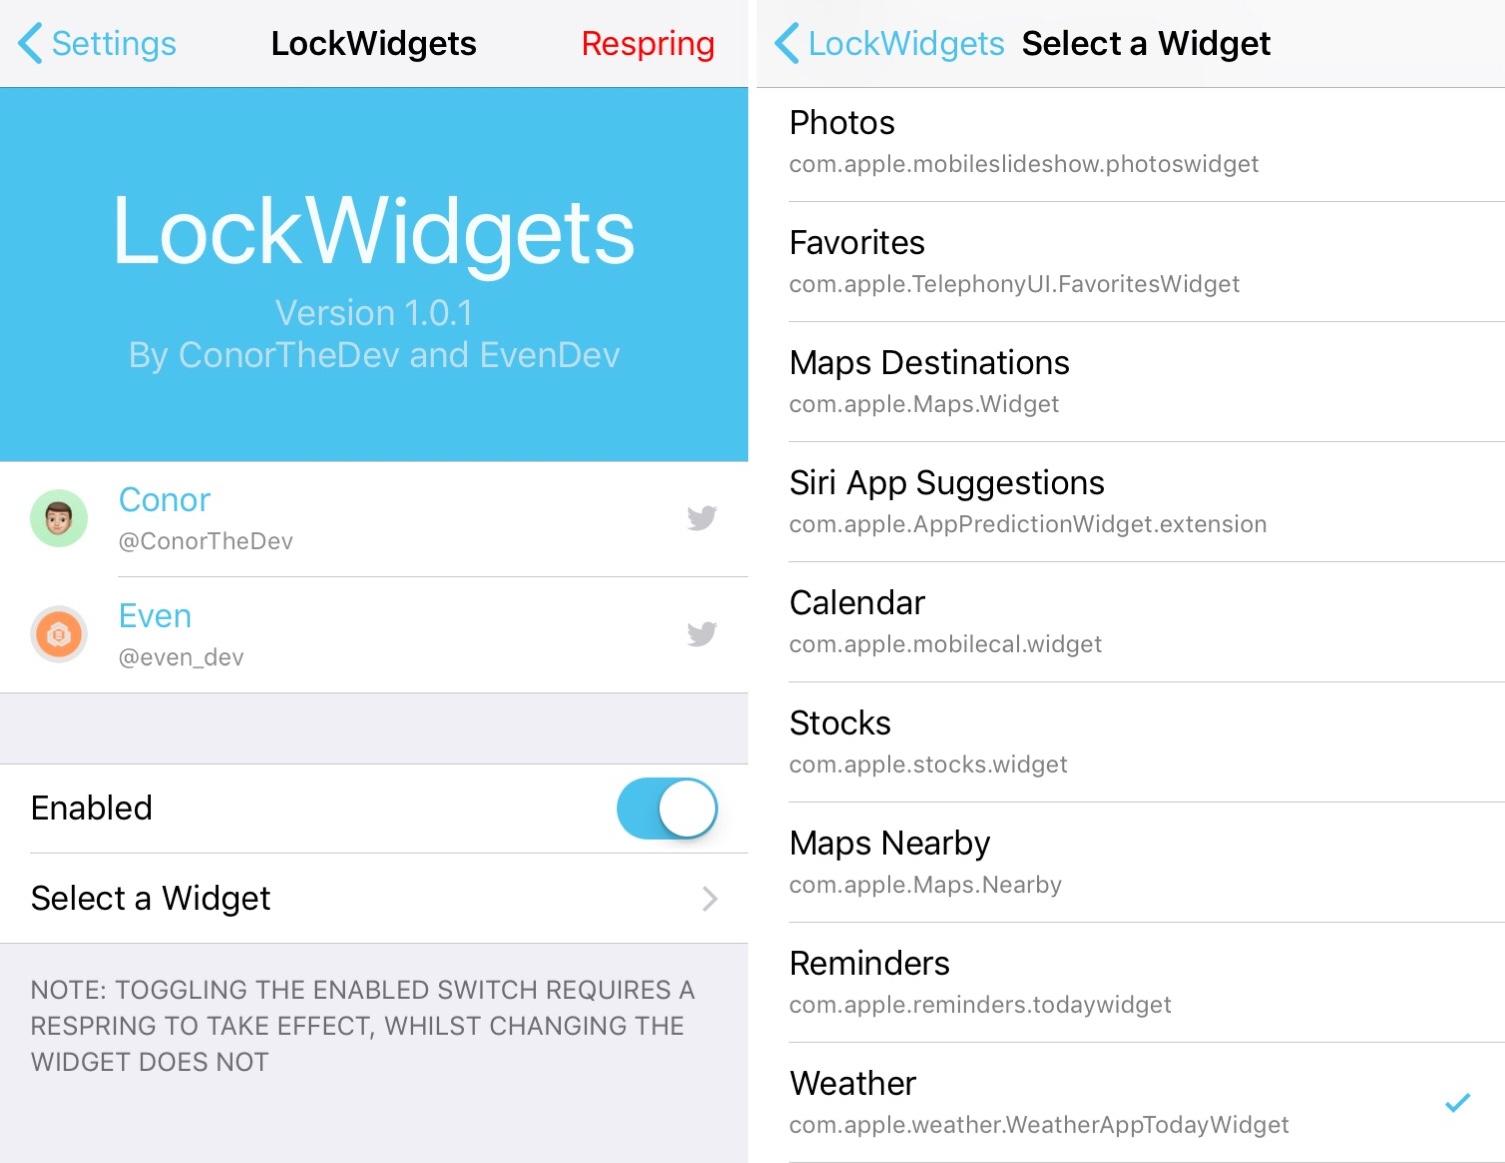 LockWidgets preferences